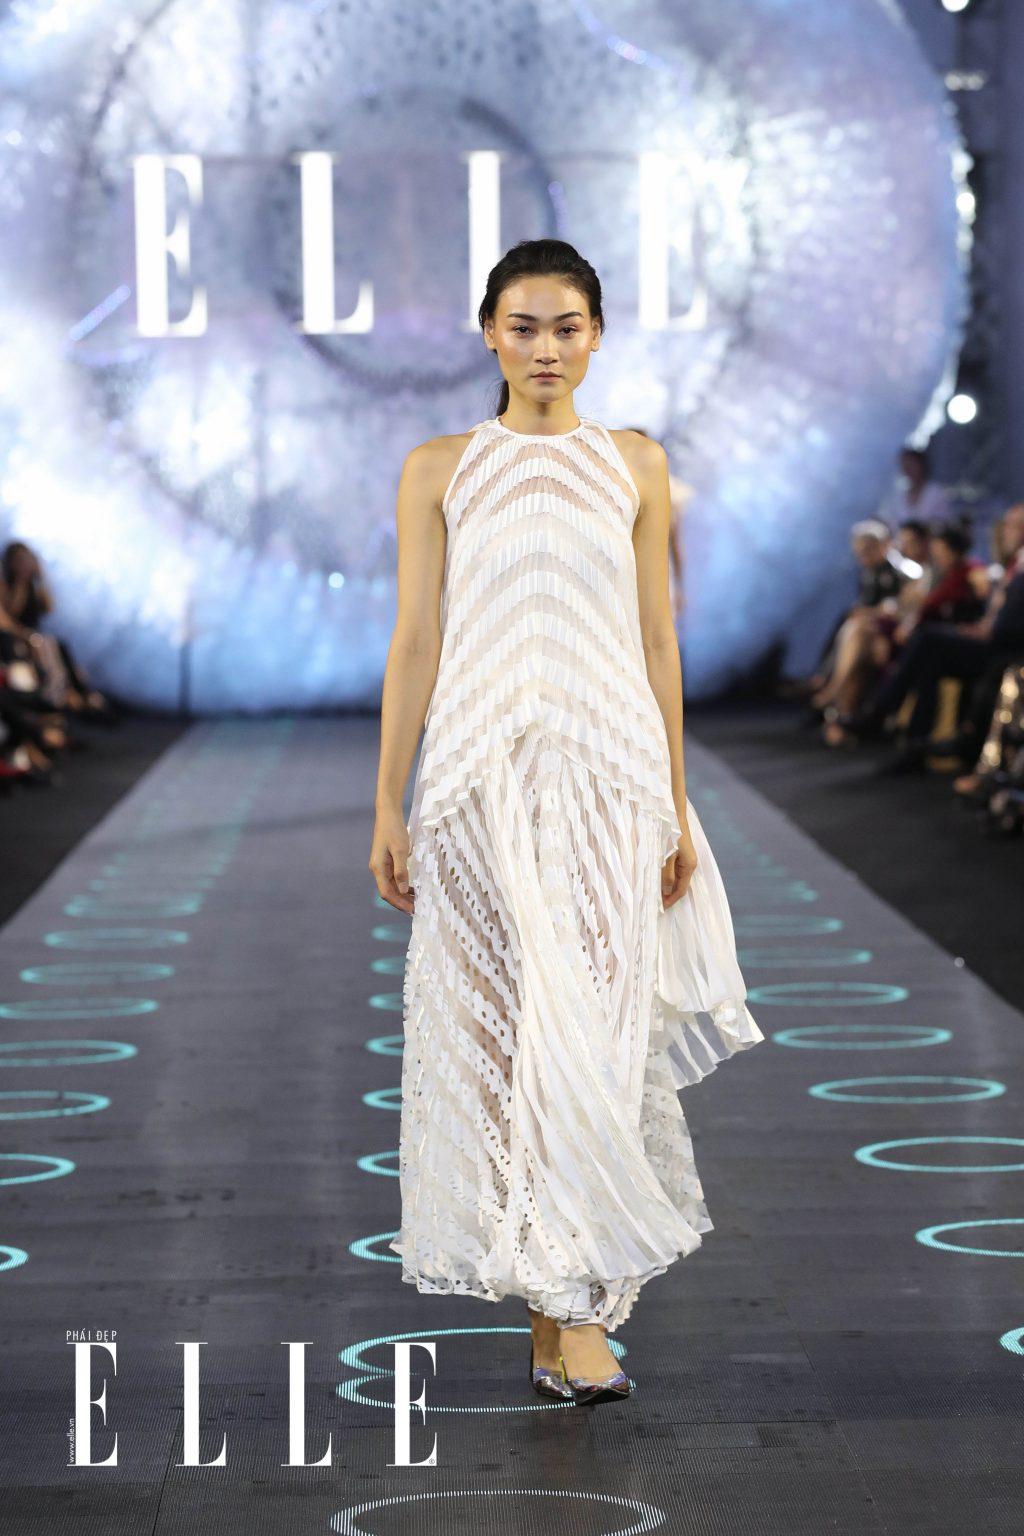 bst vinn pantararin elle fashion journey 2018 8